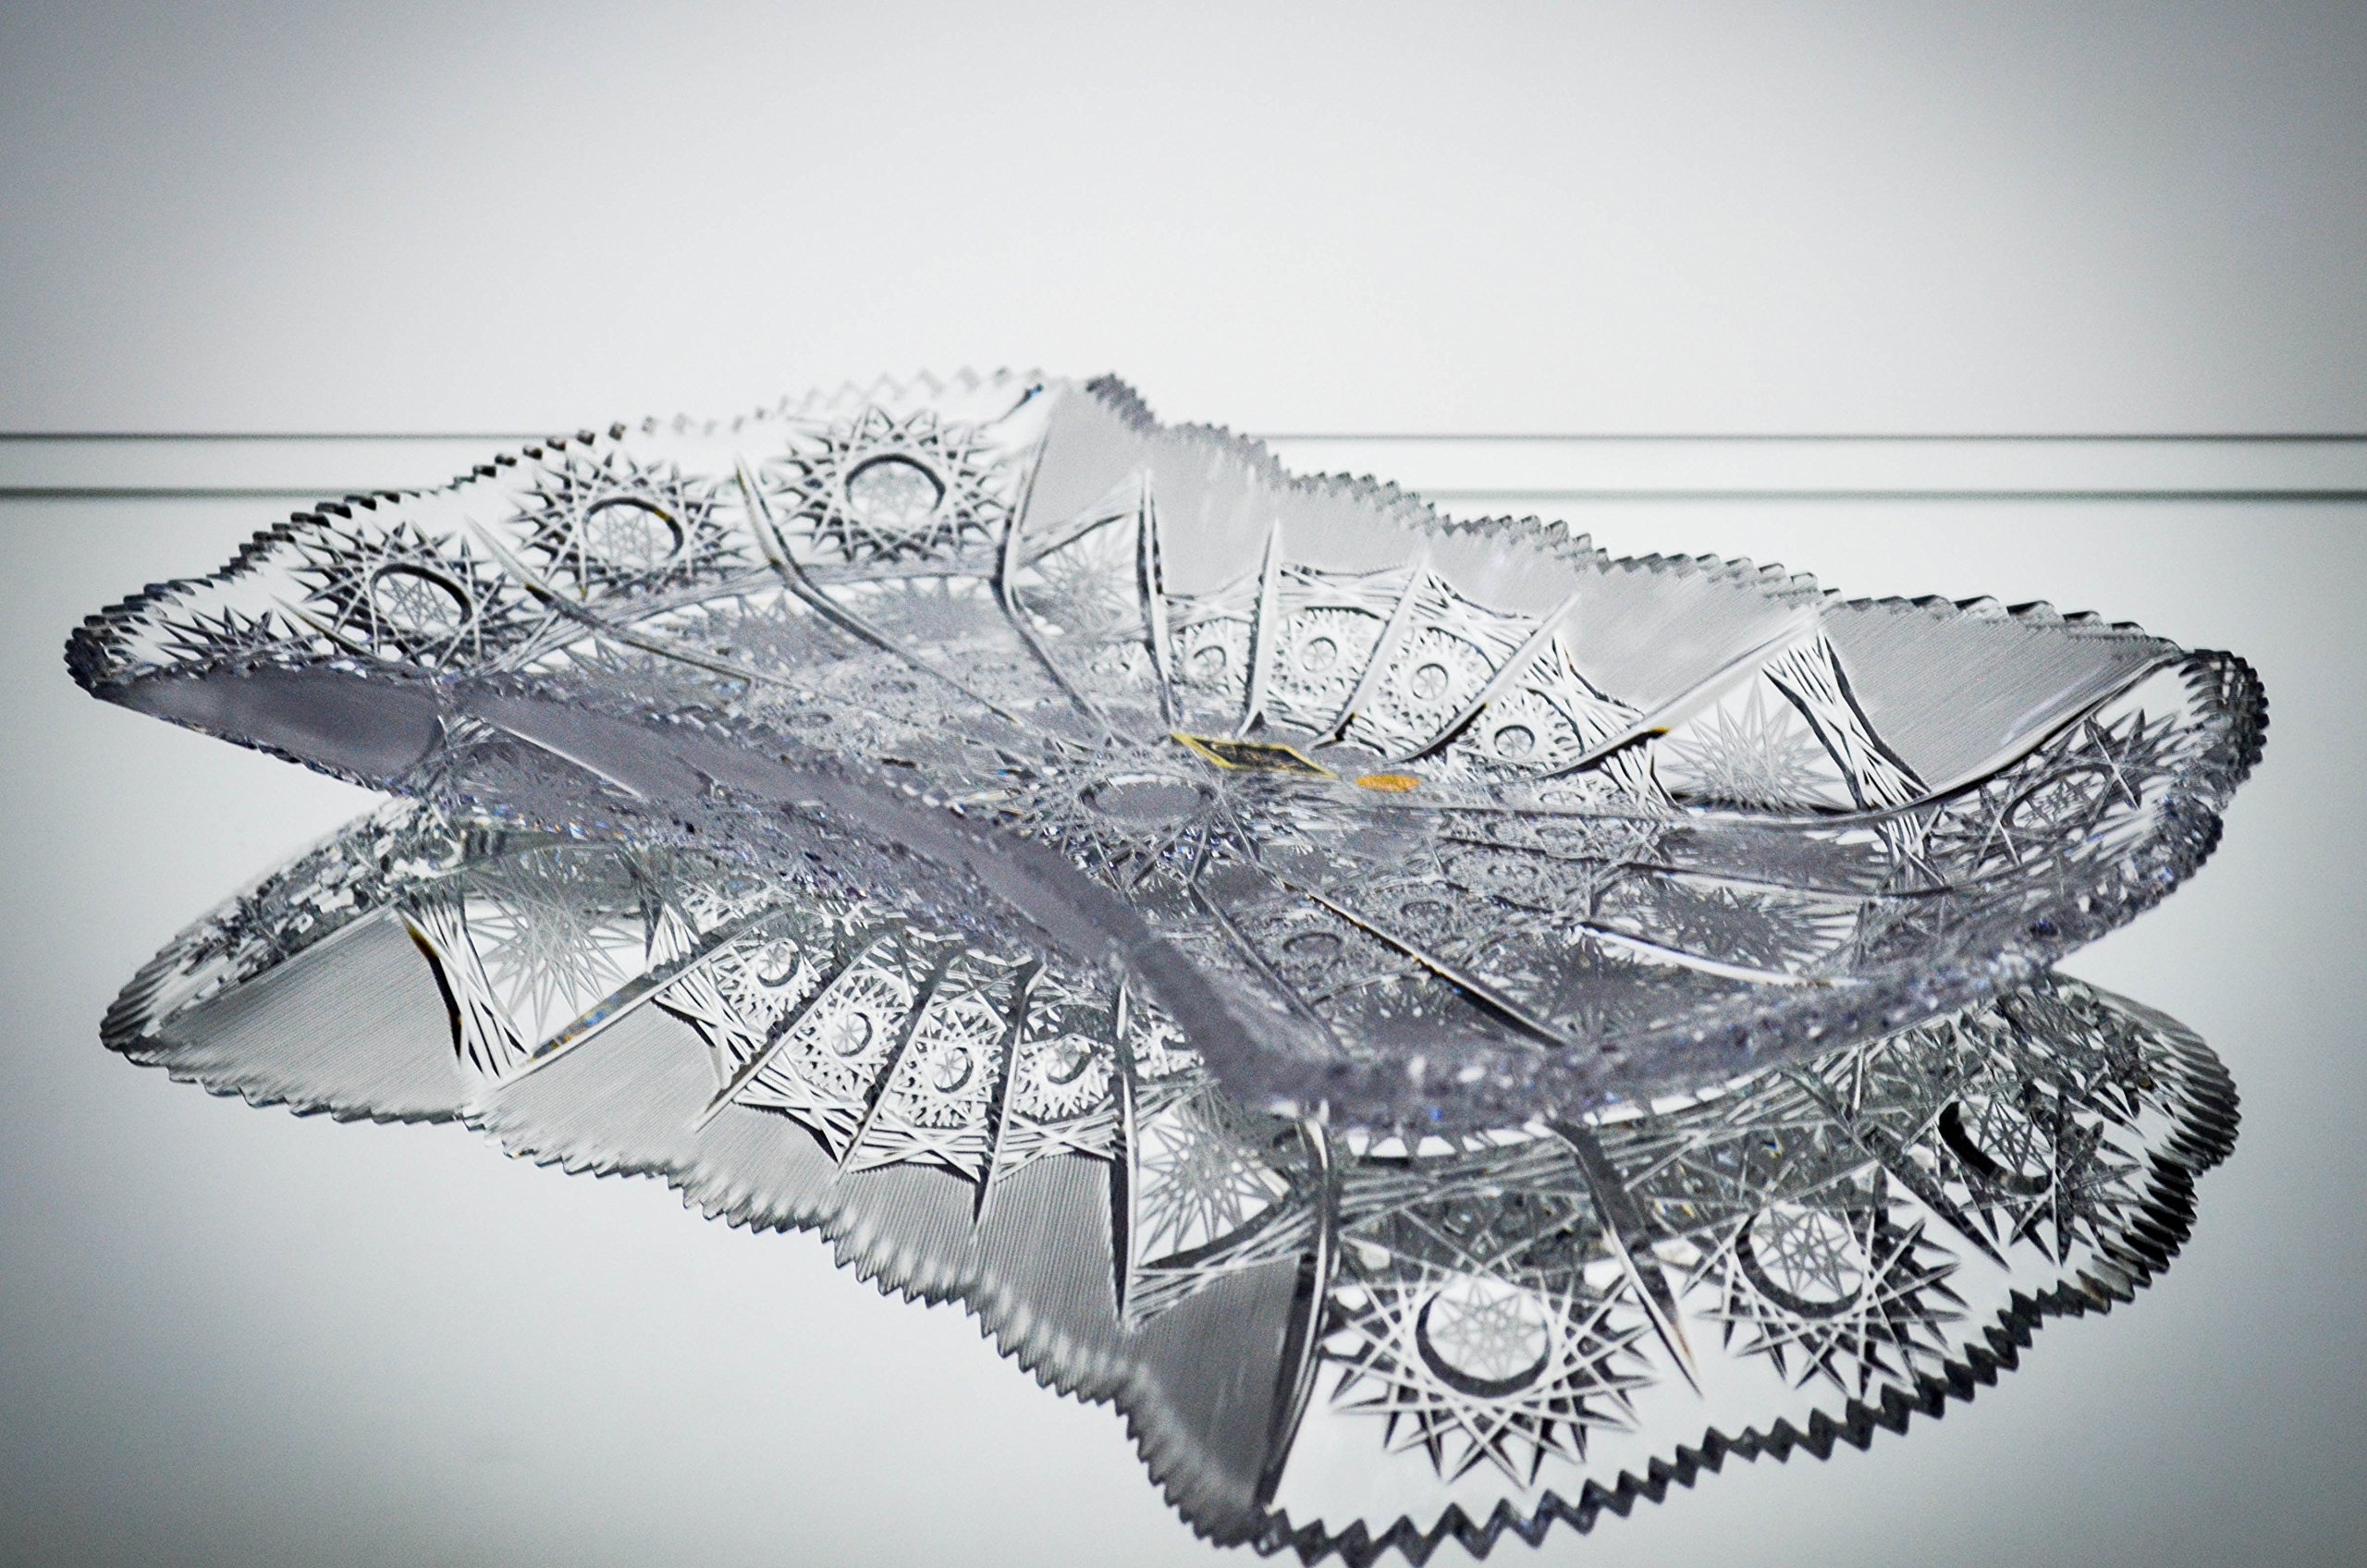 BOHEMIA CRYSTAL GLASS PLATE BOWL PLATTER 13''-L DECORATIVE WEDDING GIFT HAND CUT VINTAGE EUROPEAN DESIGN ELEGANT CENTERPIECE DISH SALADS NUTS CANDIES FRUITS DESSERTS CZECH CRYSTAL GLASS